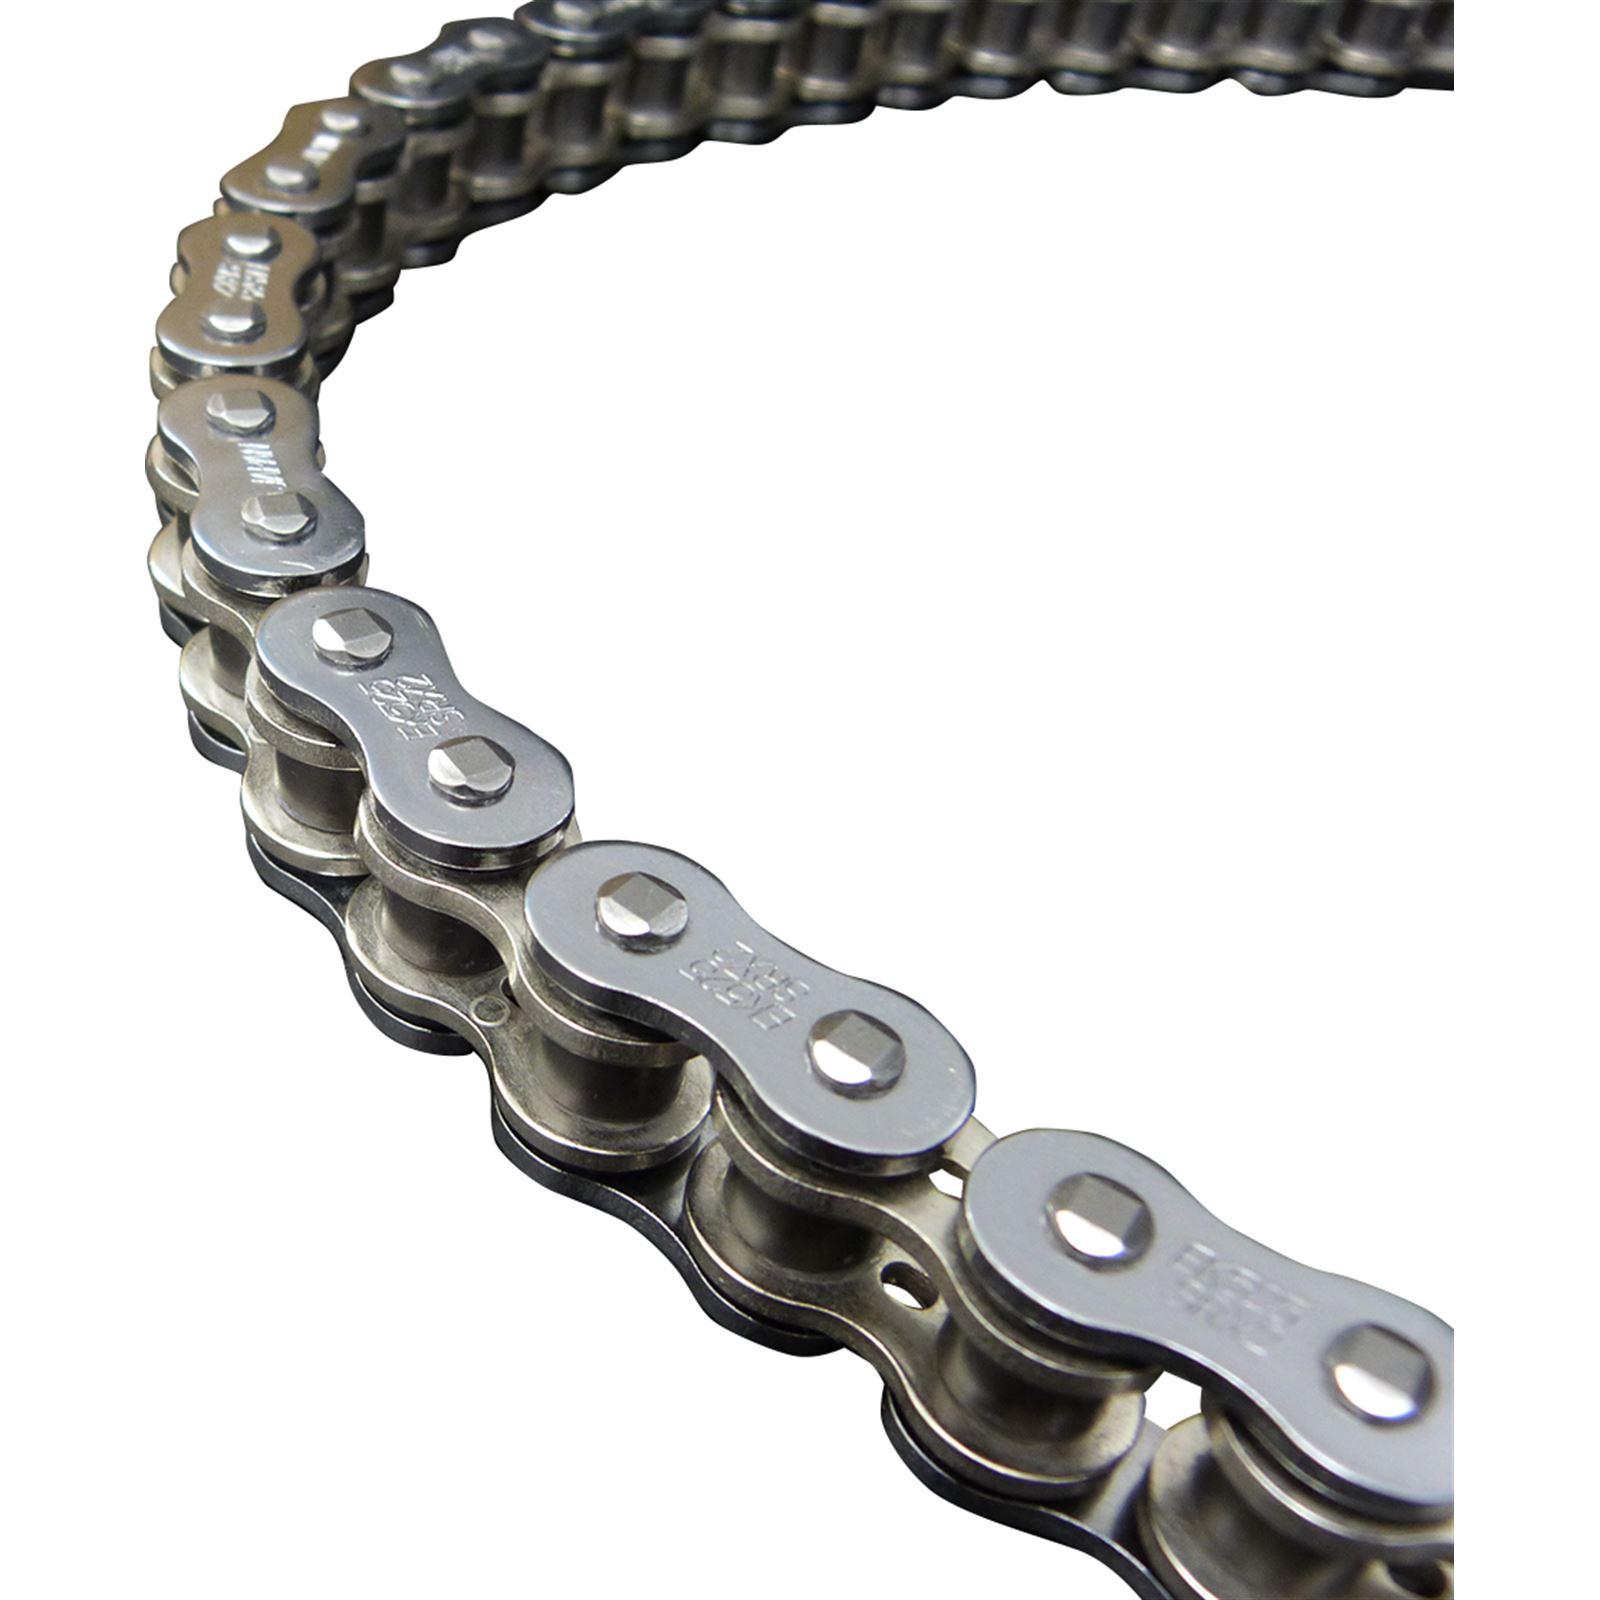 EK 520 SRX2 - Chain - 100 Links